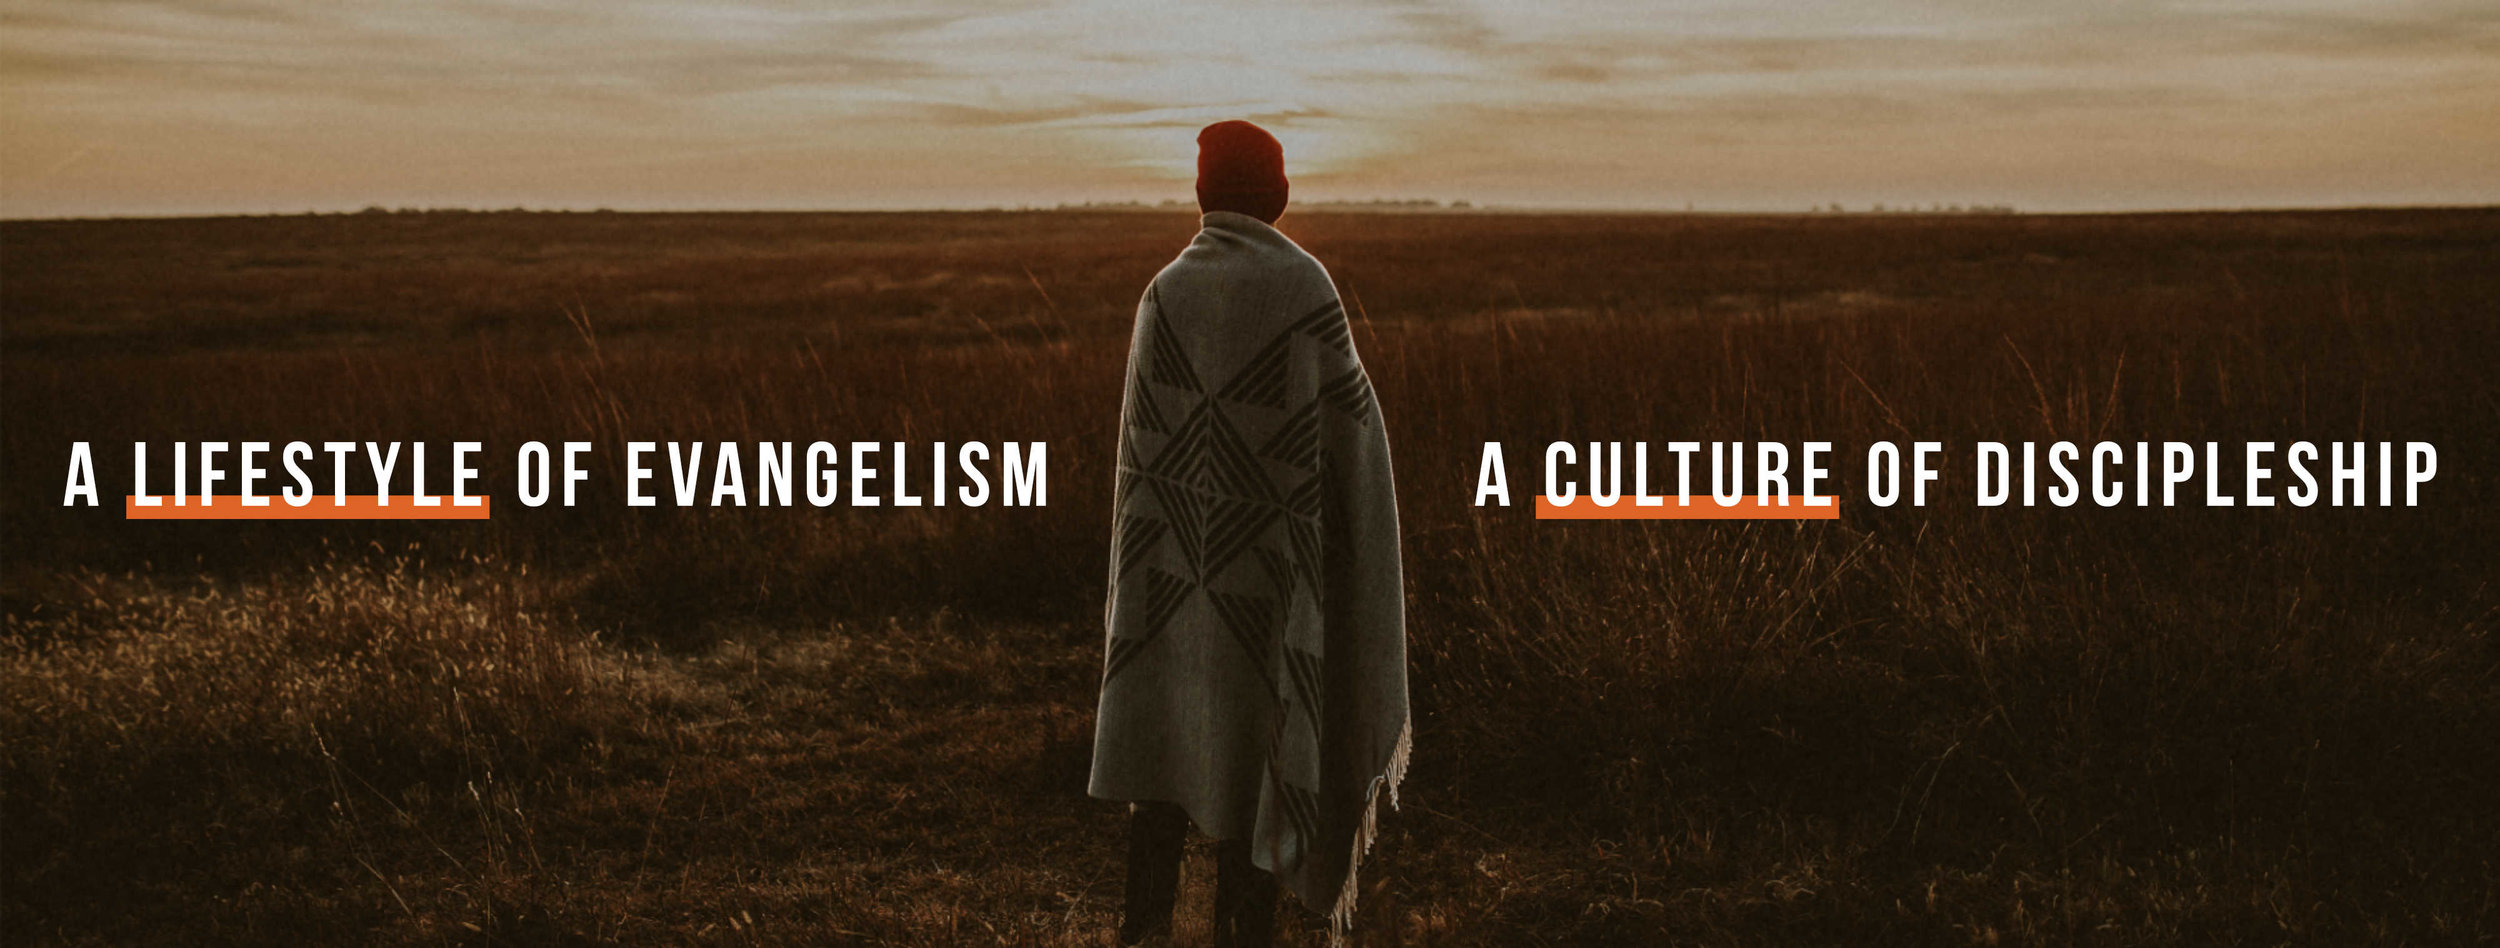 Lifestyle of Evangelism, Culture of Discipleship FB LQ.jpg